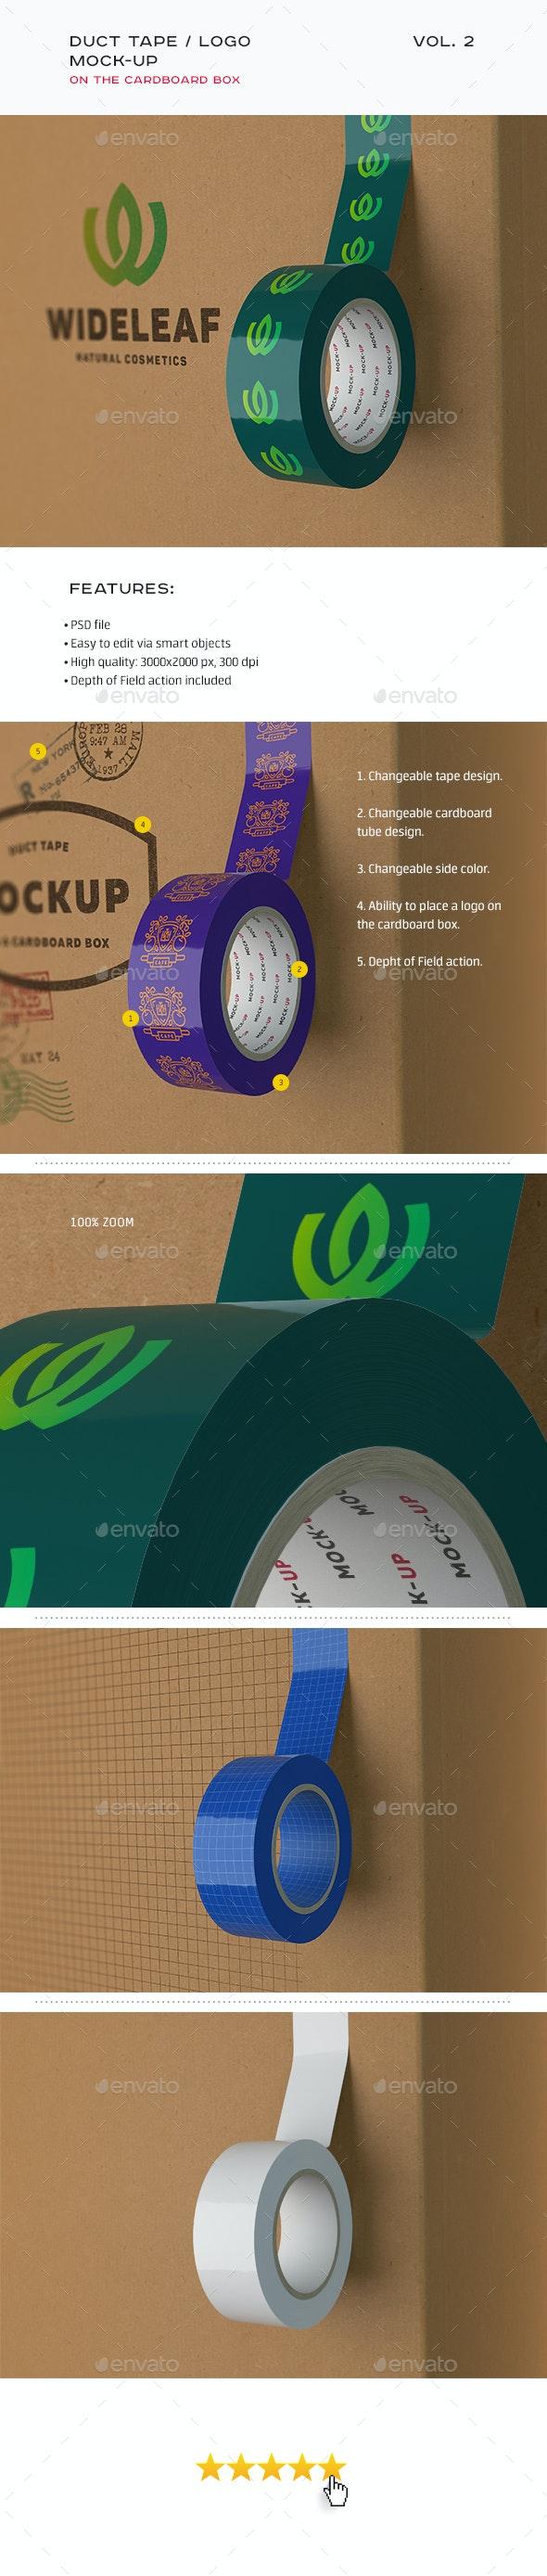 Duct Tape / Logo Mock-up vol. 2 - Product Mock-Ups Graphics